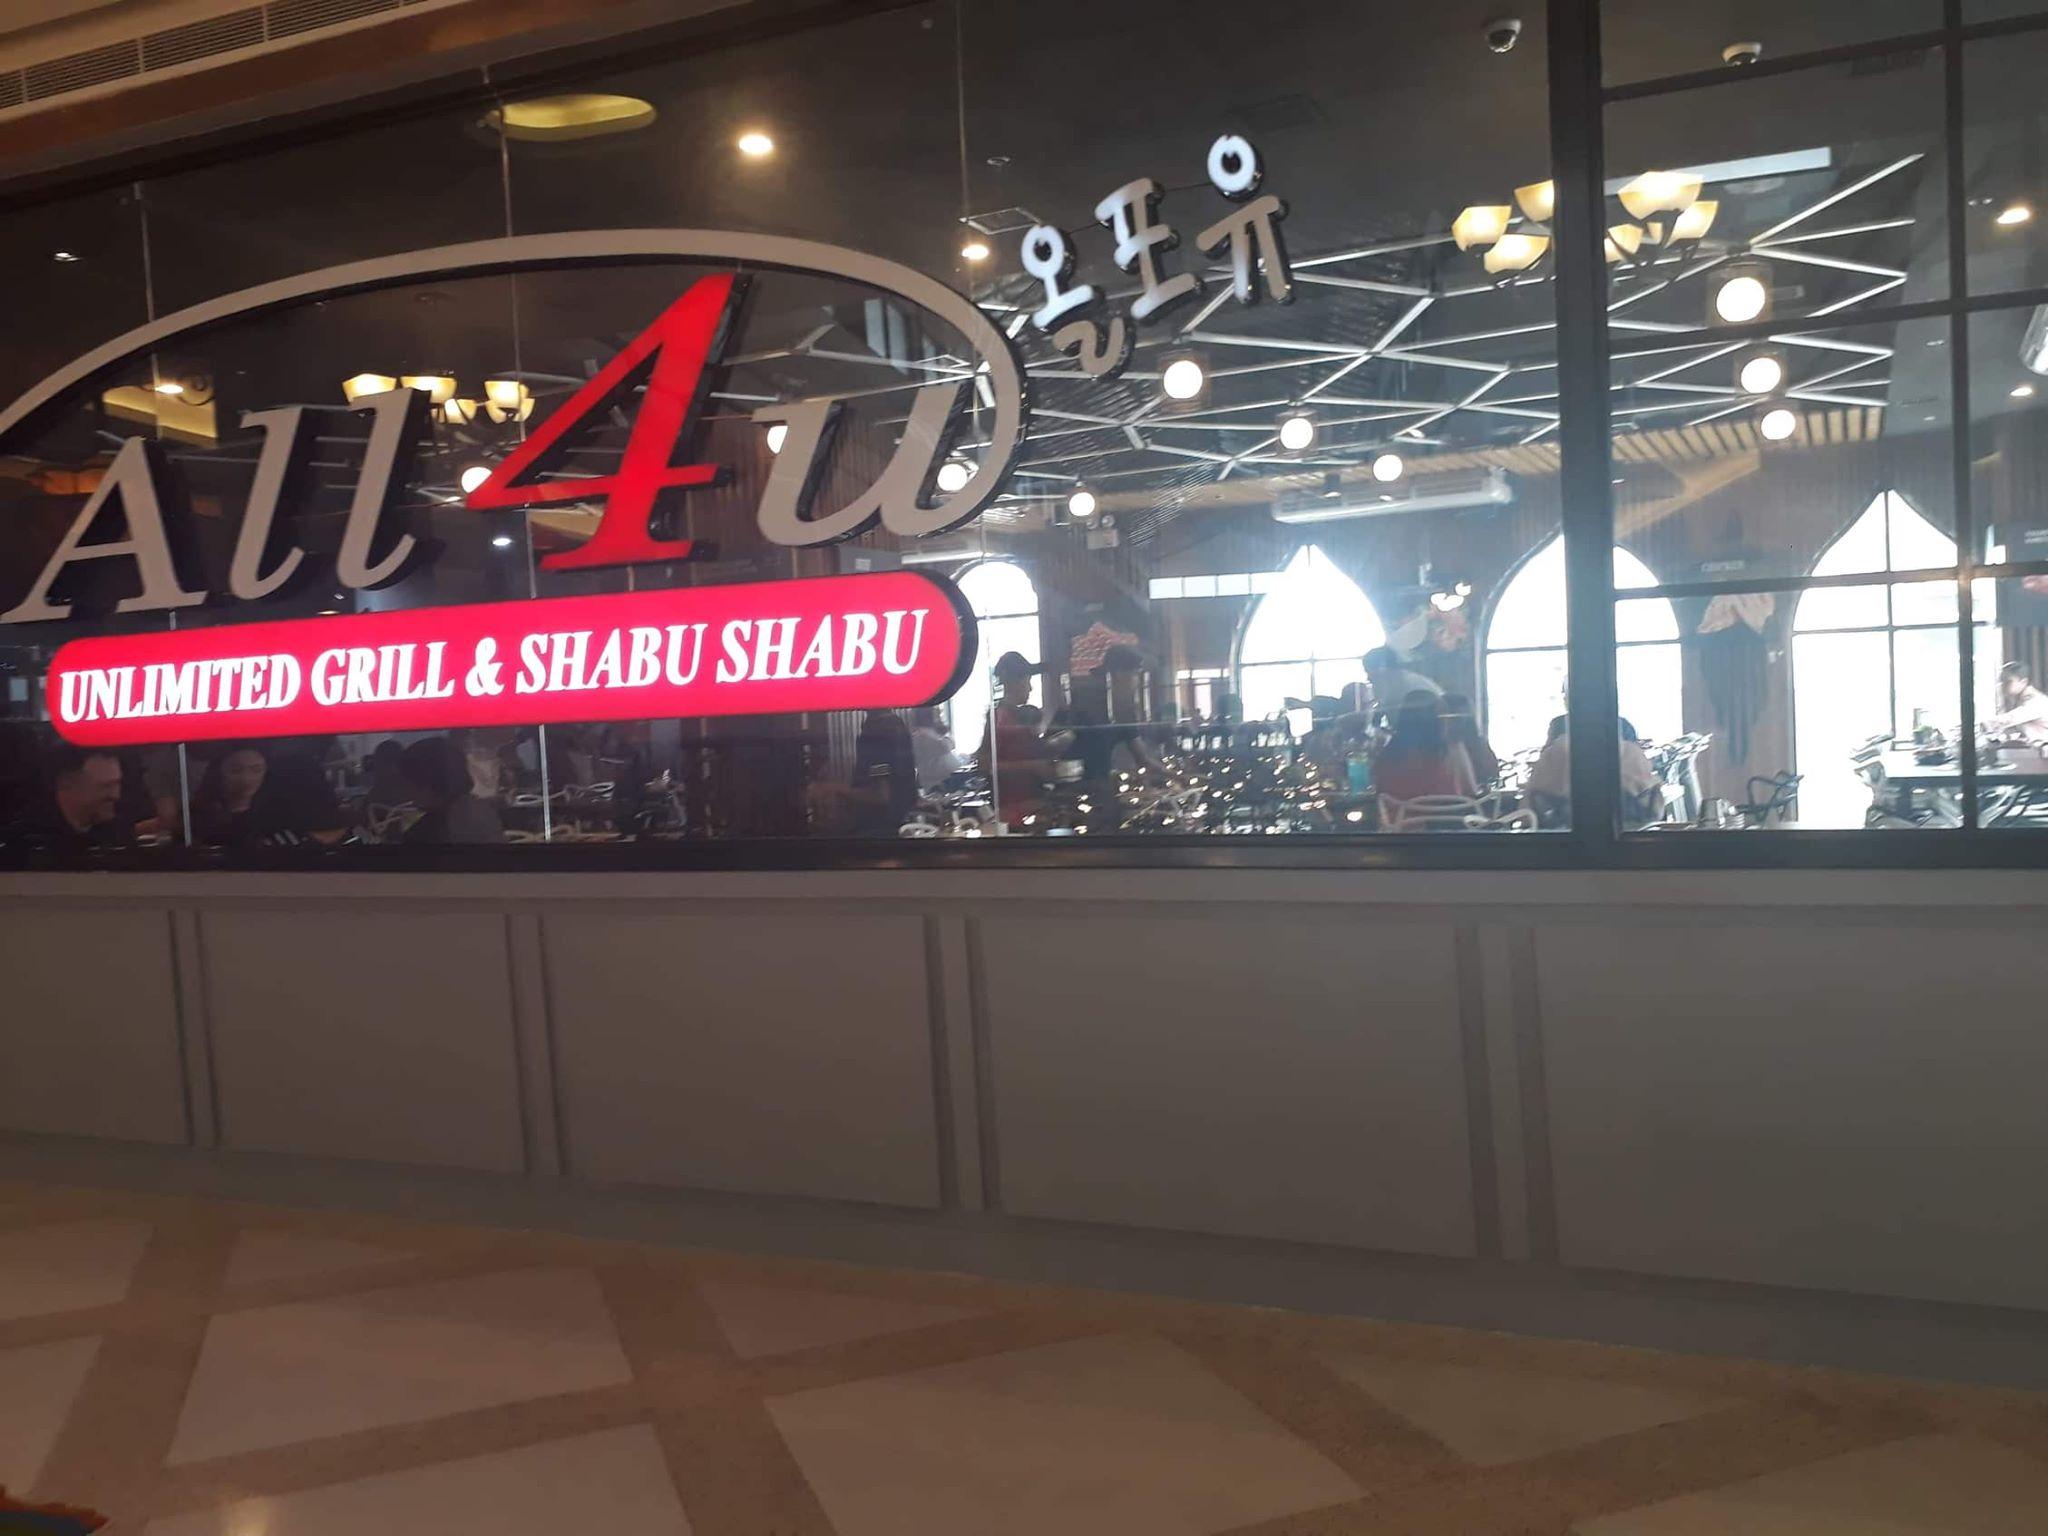 All4u Unlimited Grill And Shabu Shabu In Venice Grand Canal Mall Mckinley Hill Diamond In The Rough